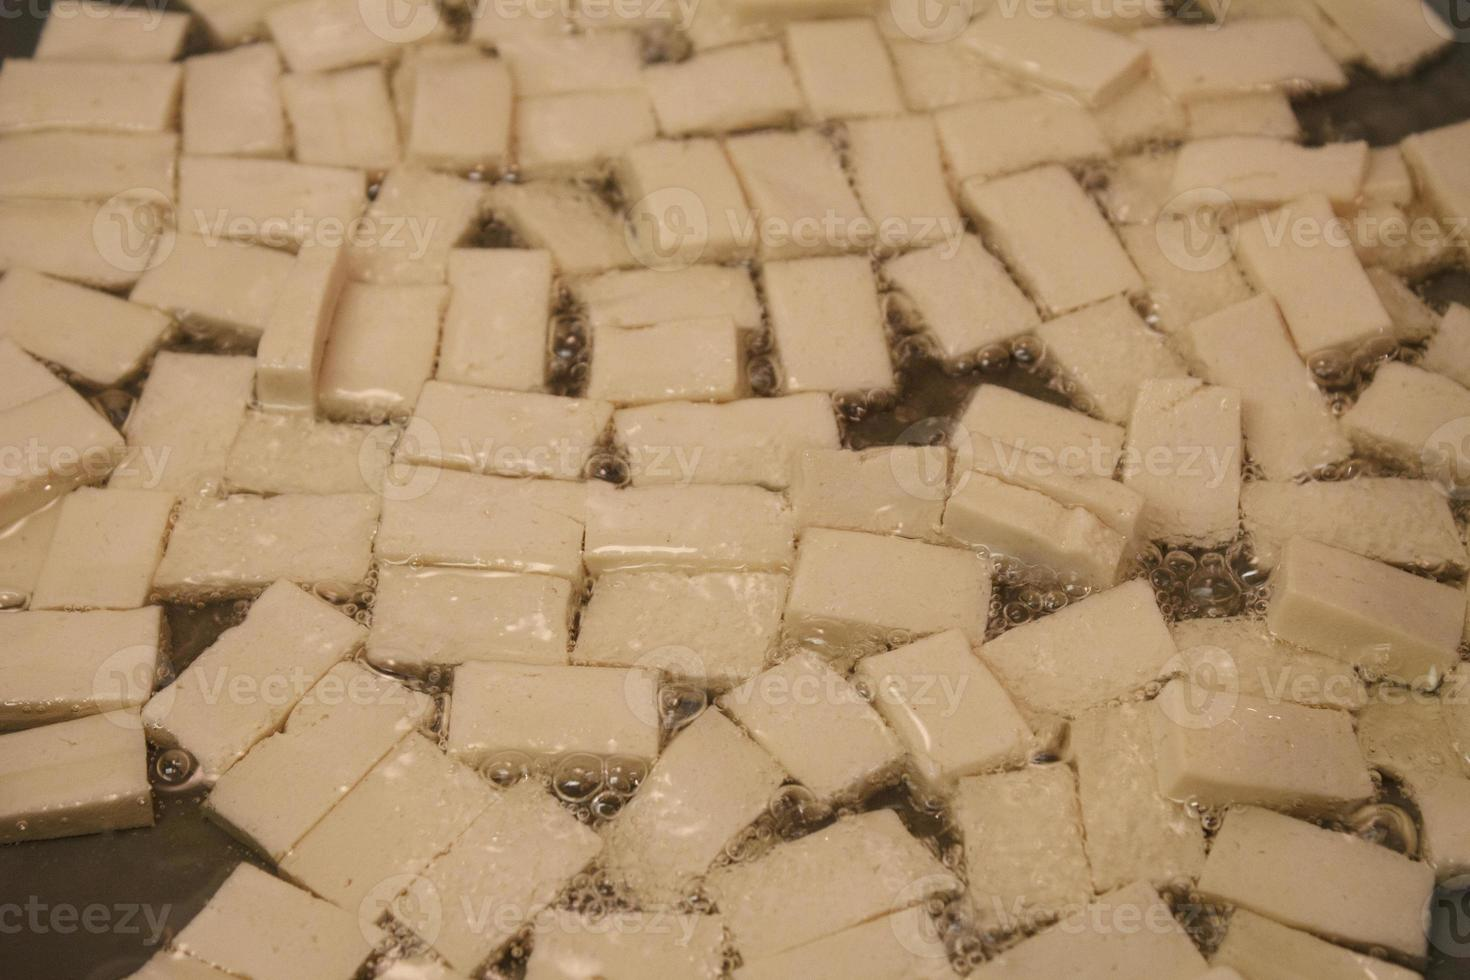 närbild på fasta tofu-kvadrater som steker i olja foto